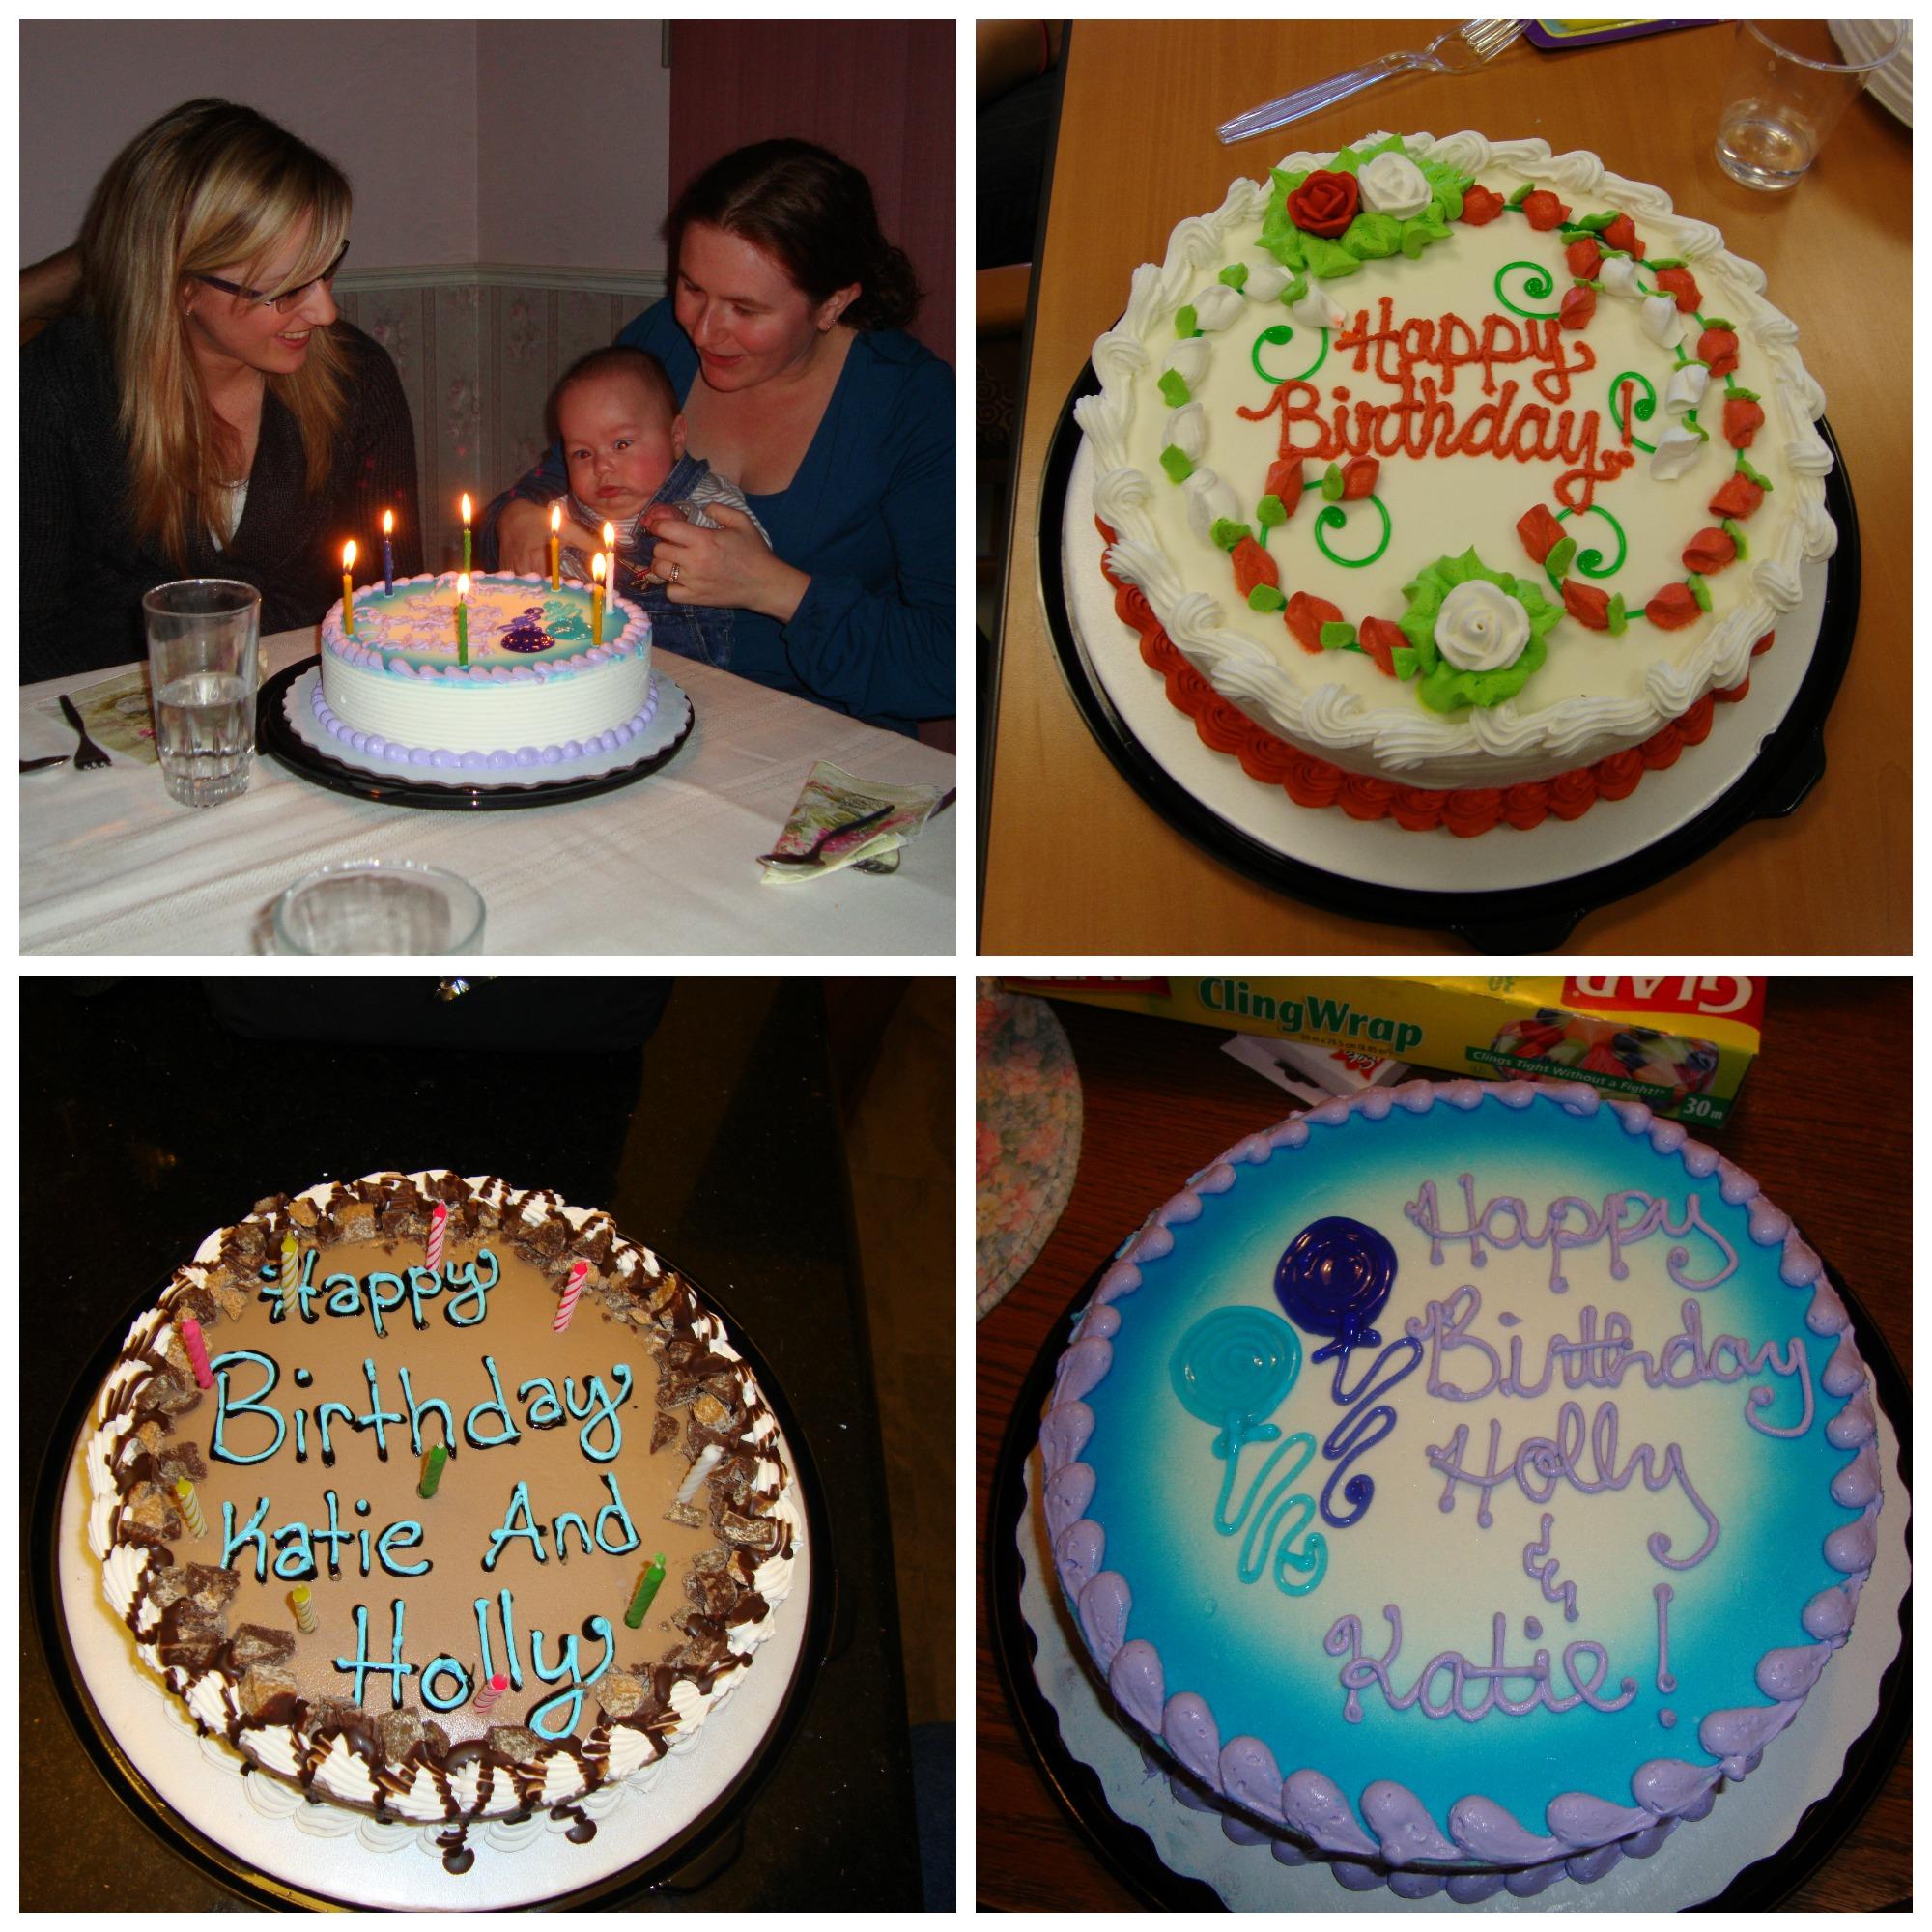 Remarkable Craftylillybargainbin Blogspot Com Dairy Queen Birthday Cake Funny Birthday Cards Online Alyptdamsfinfo